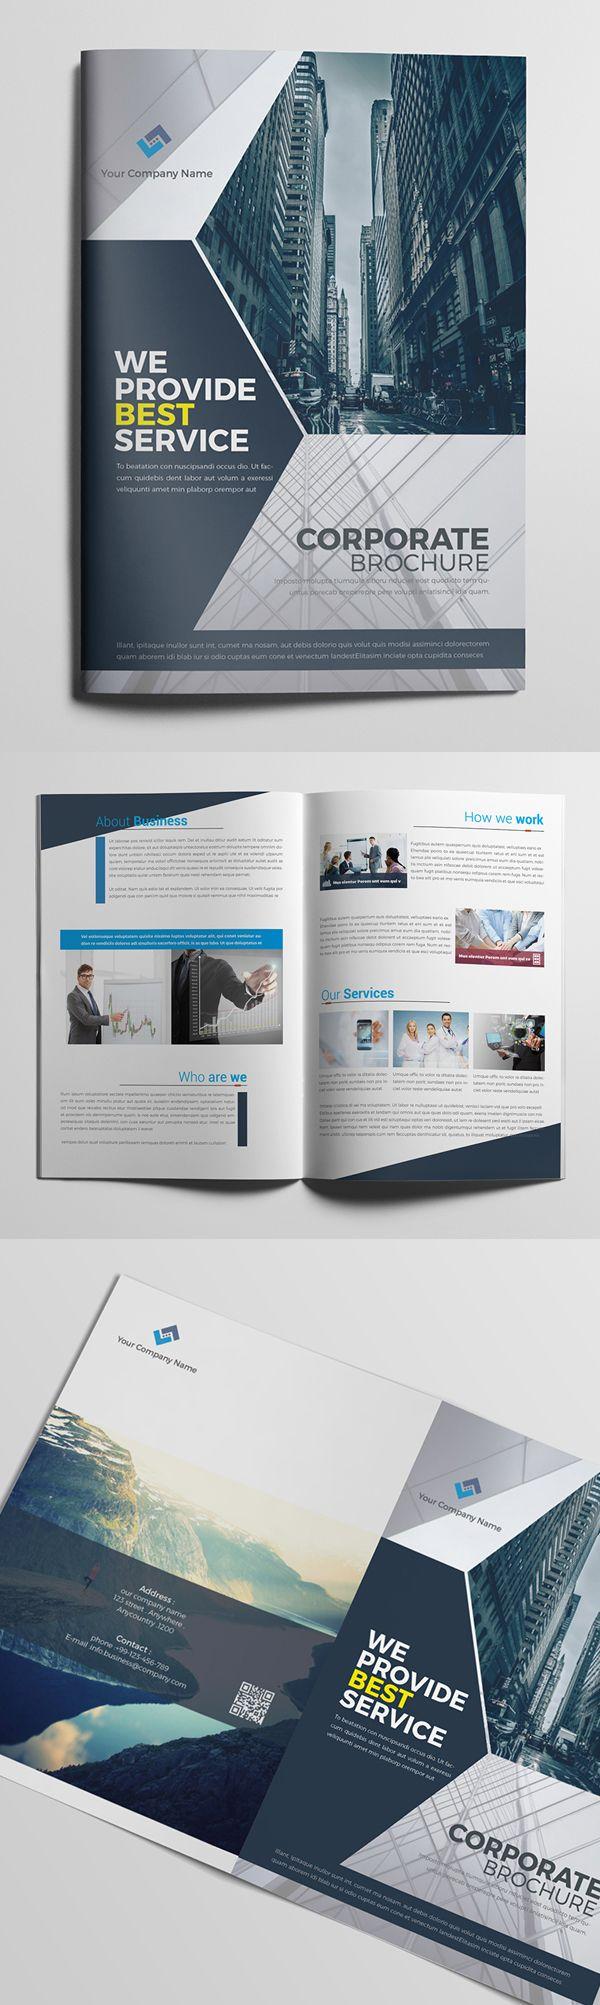 Corporate Brochure  Catalog Design   Layout